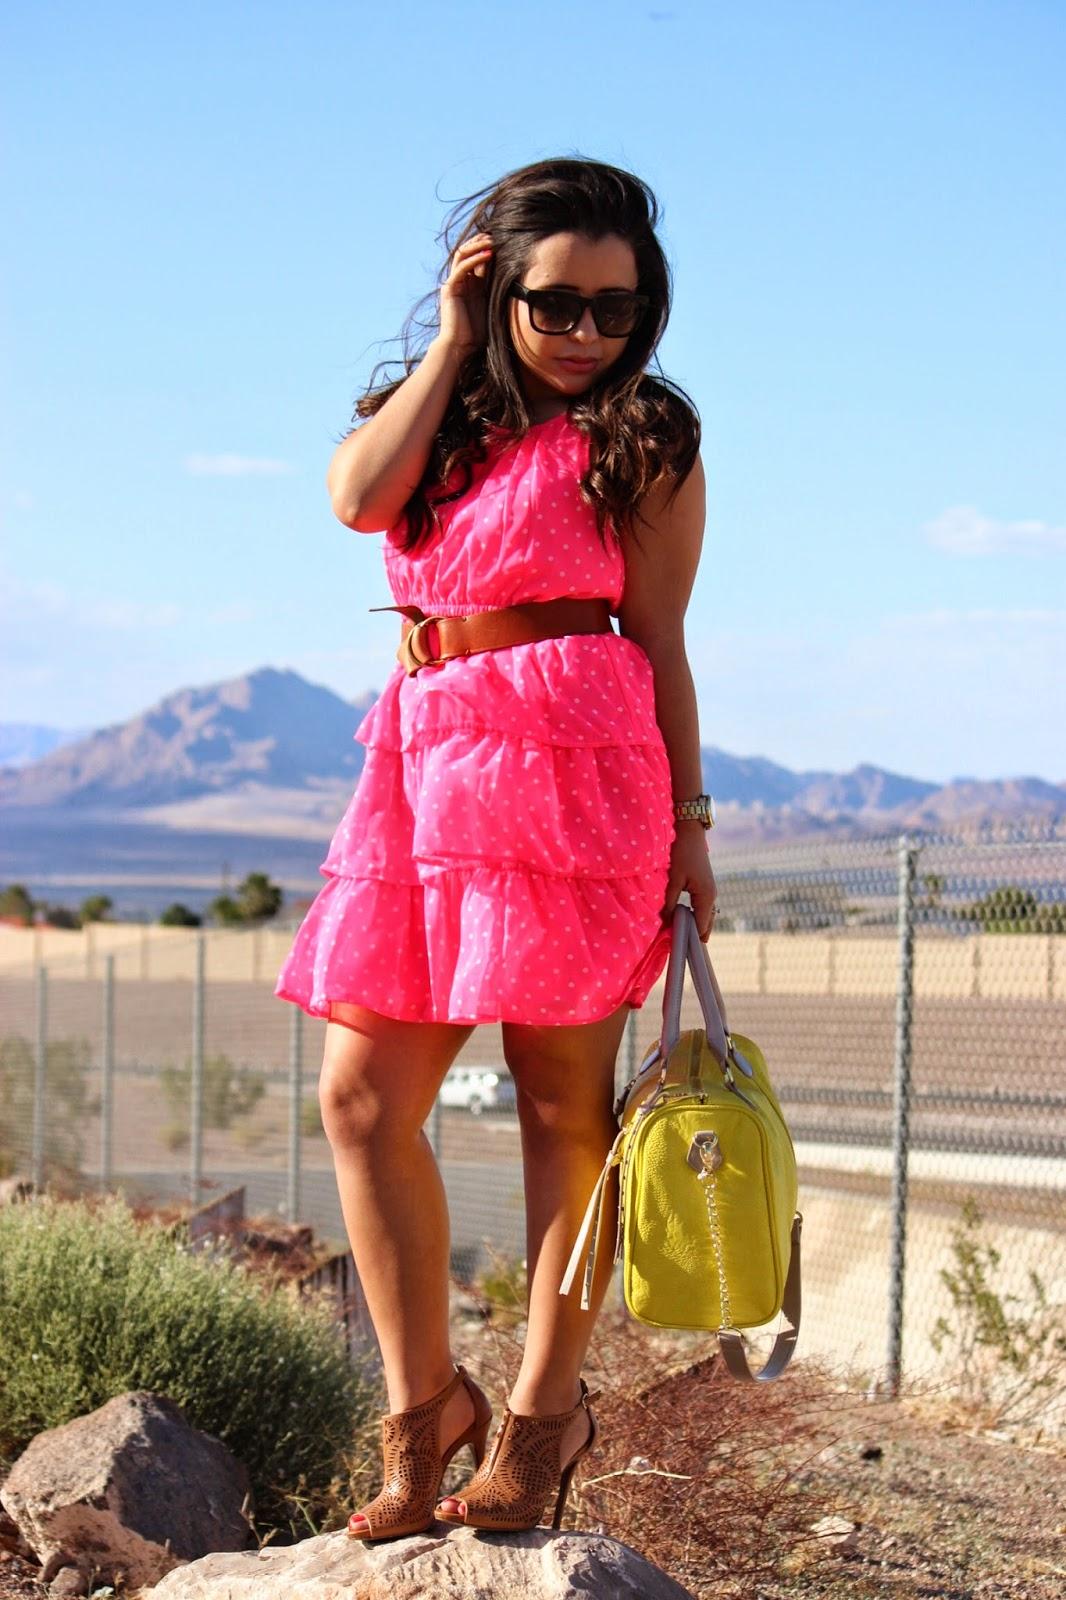 Las Vegas fashion, las vegas blogger, what to wear in vegas, latina blogger, latina street style, colombian street style, moda bogotana